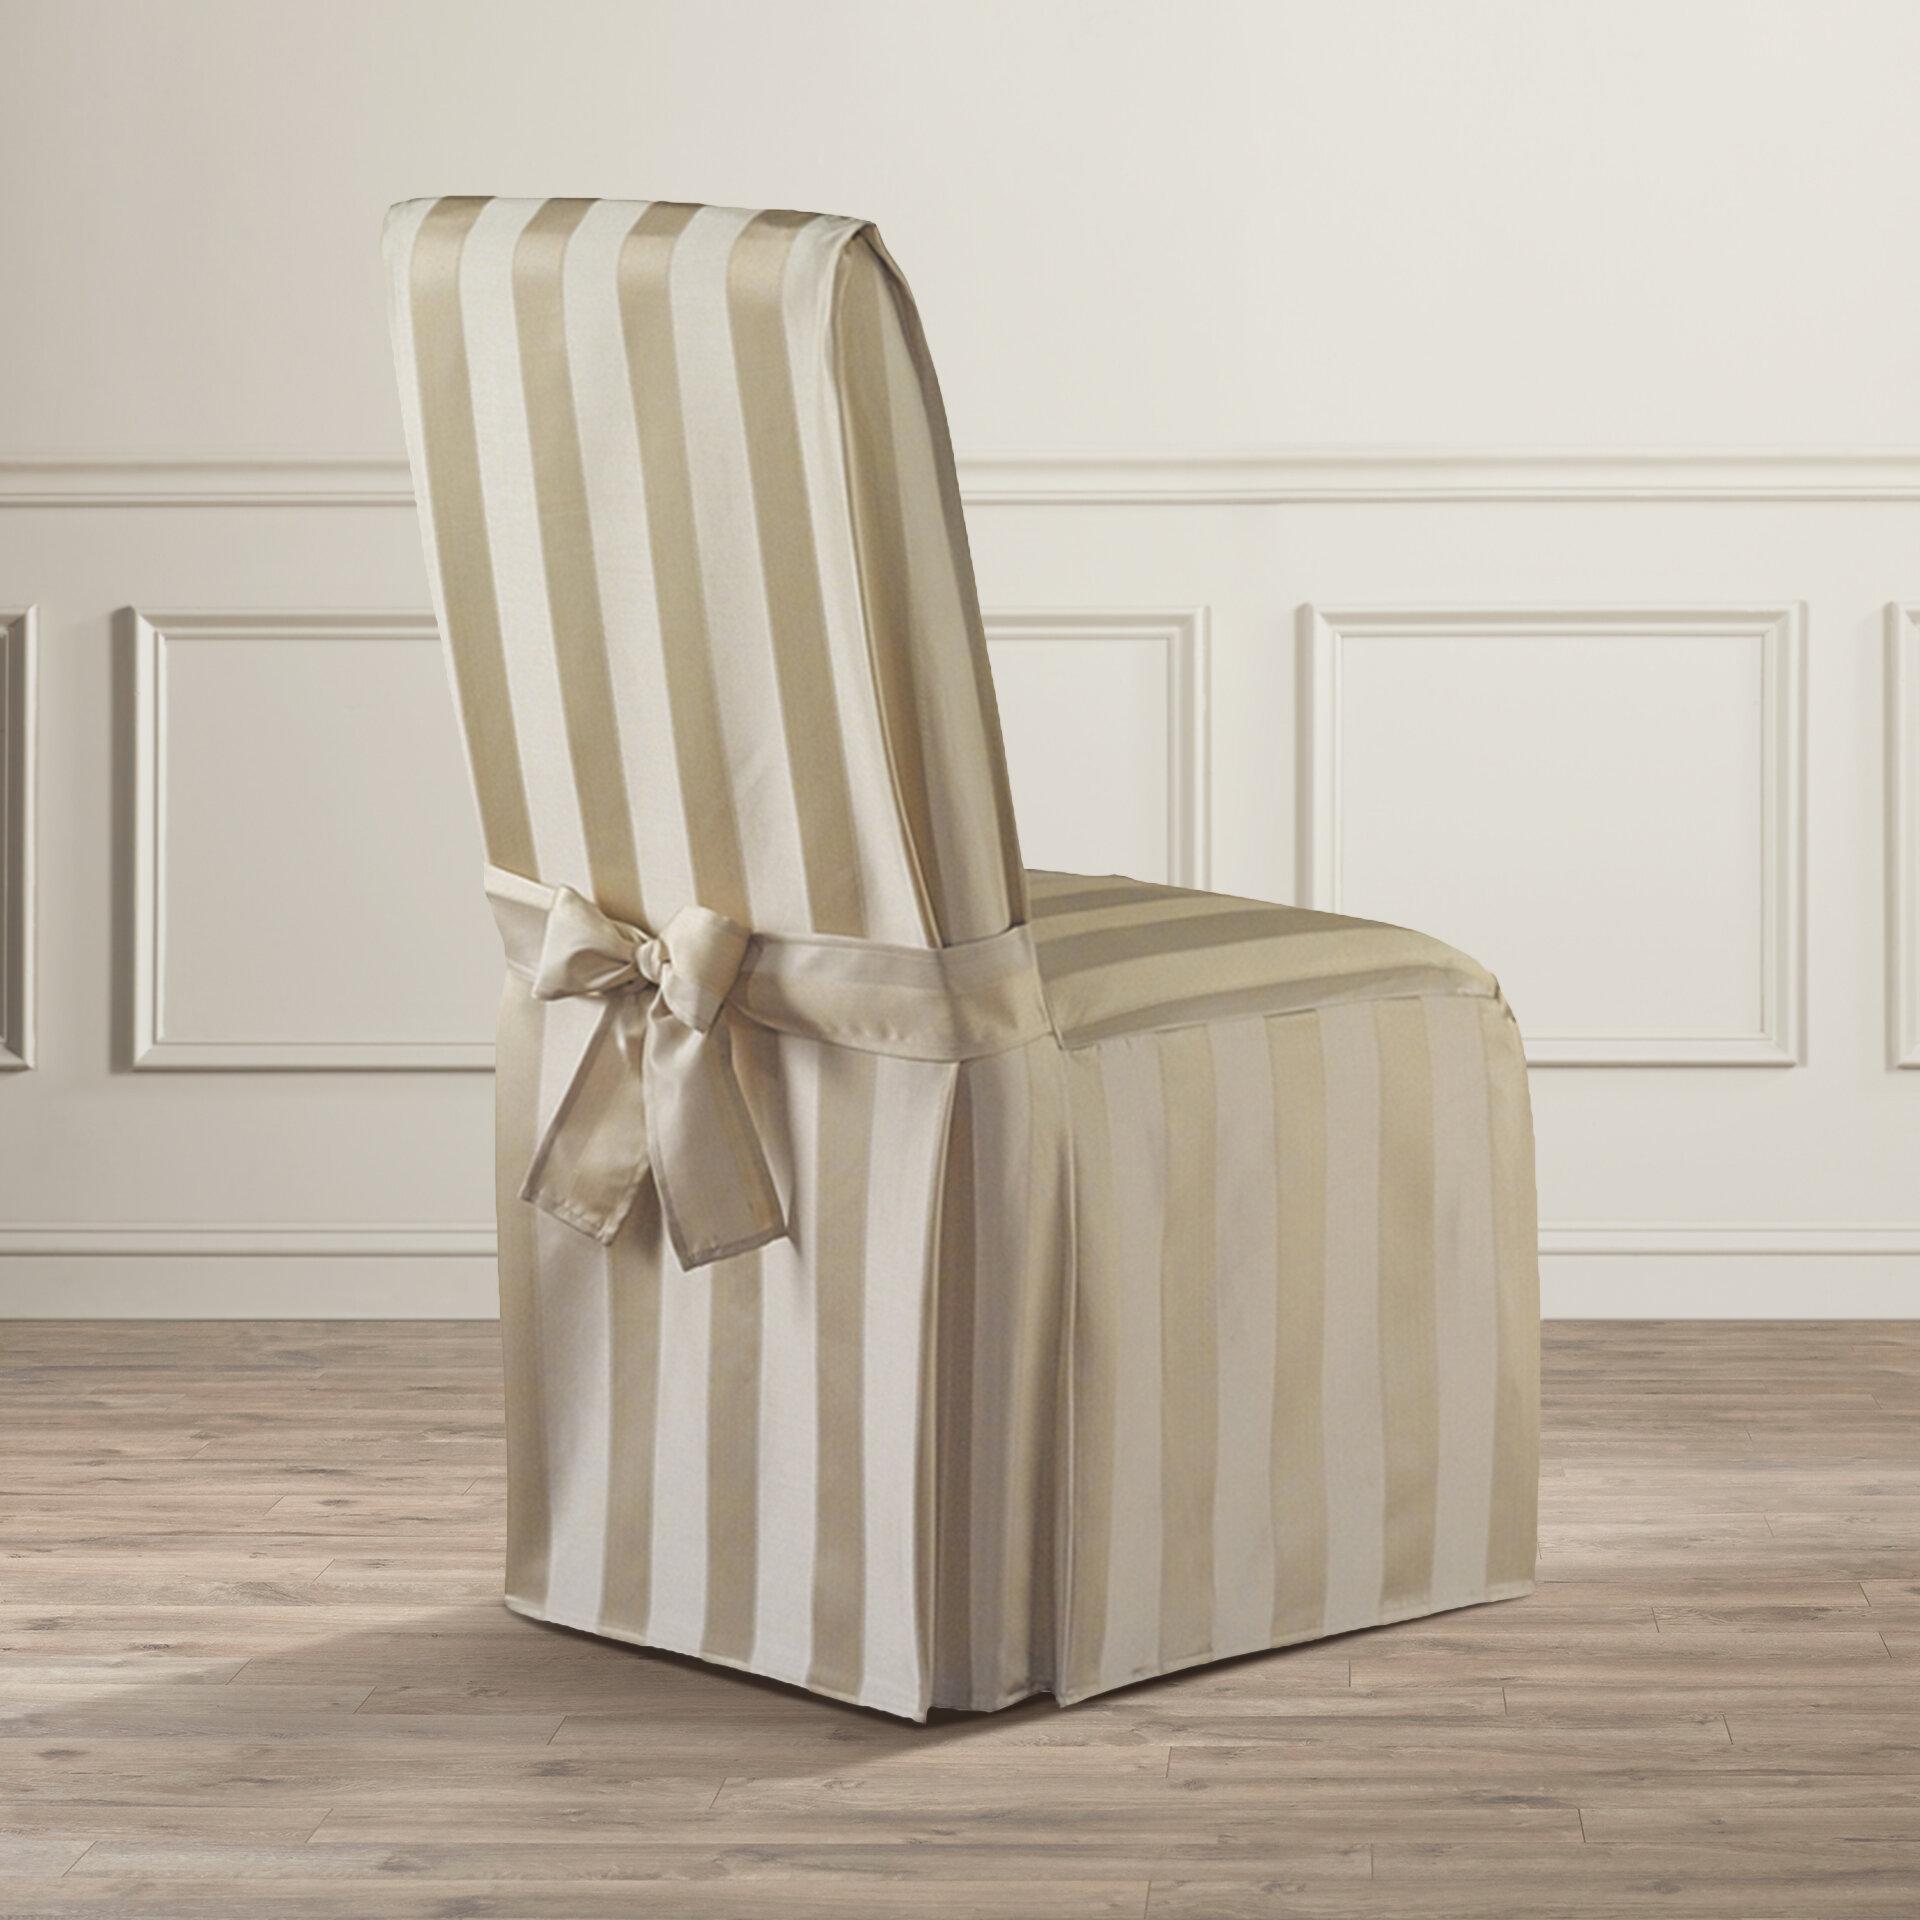 Astoria Grand Box Cushion Dining Chair Slipcover Reviews Wayfair Ca